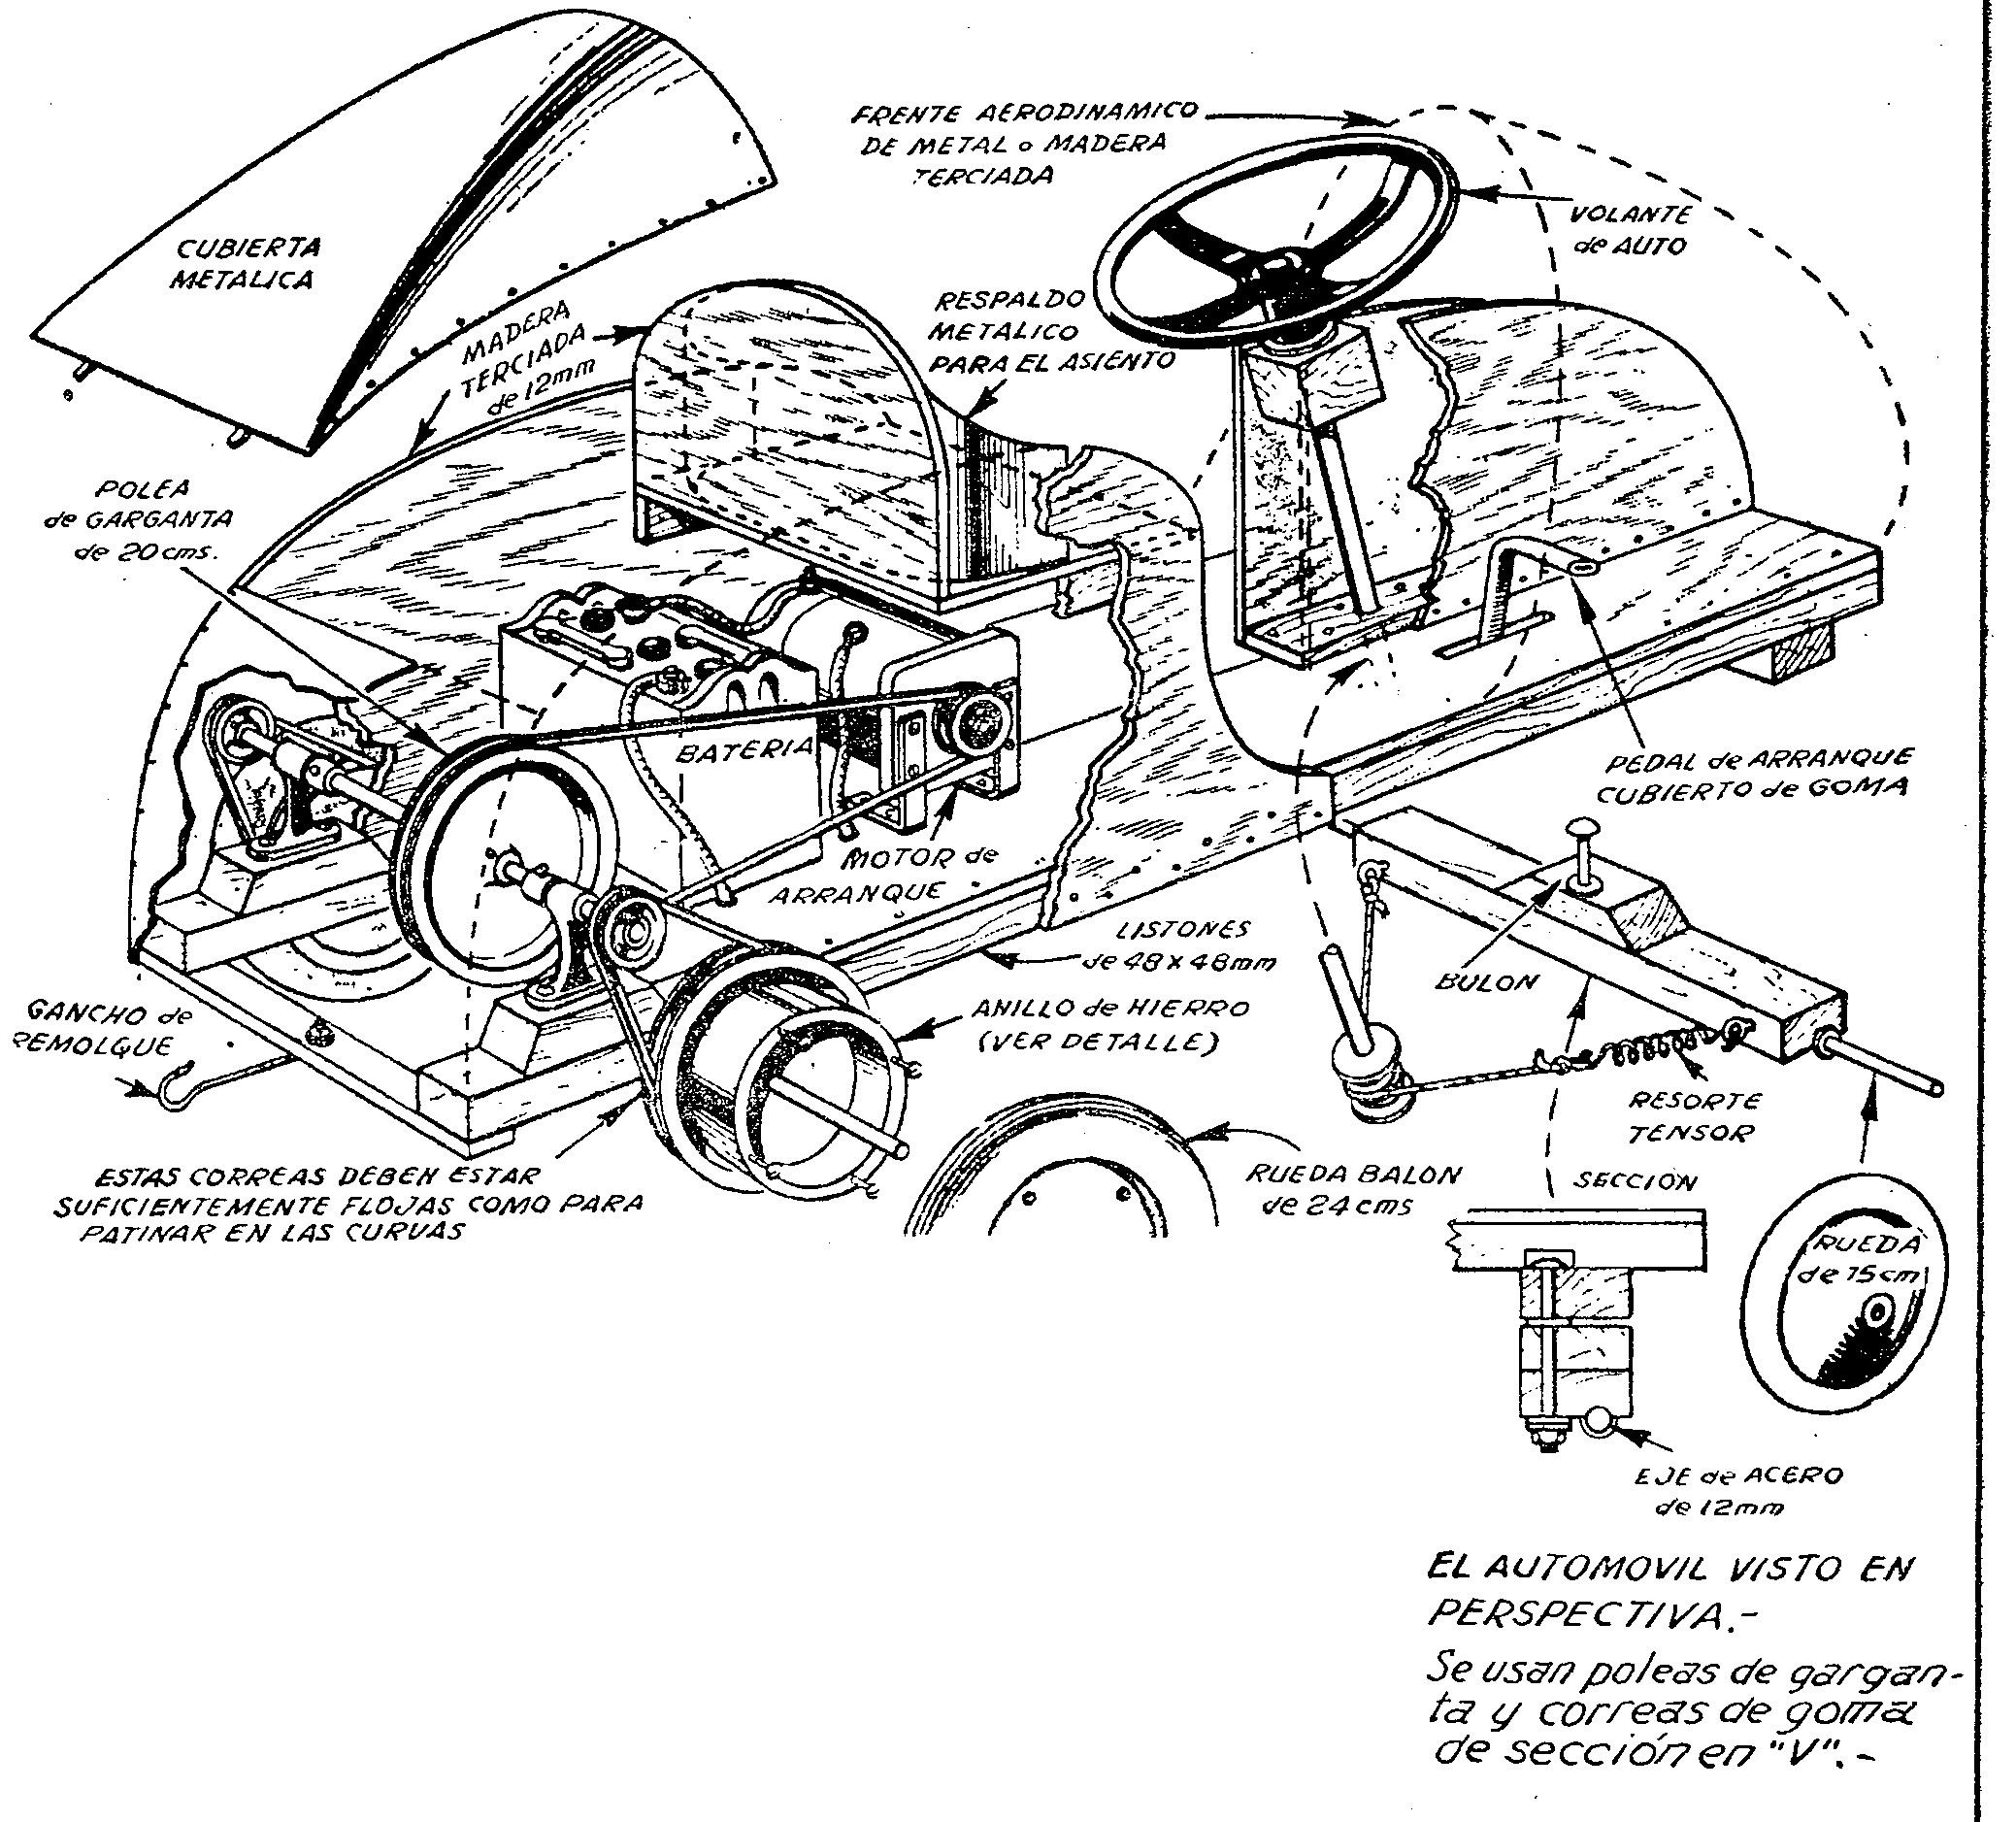 Como fabricar un carro electrico para niños